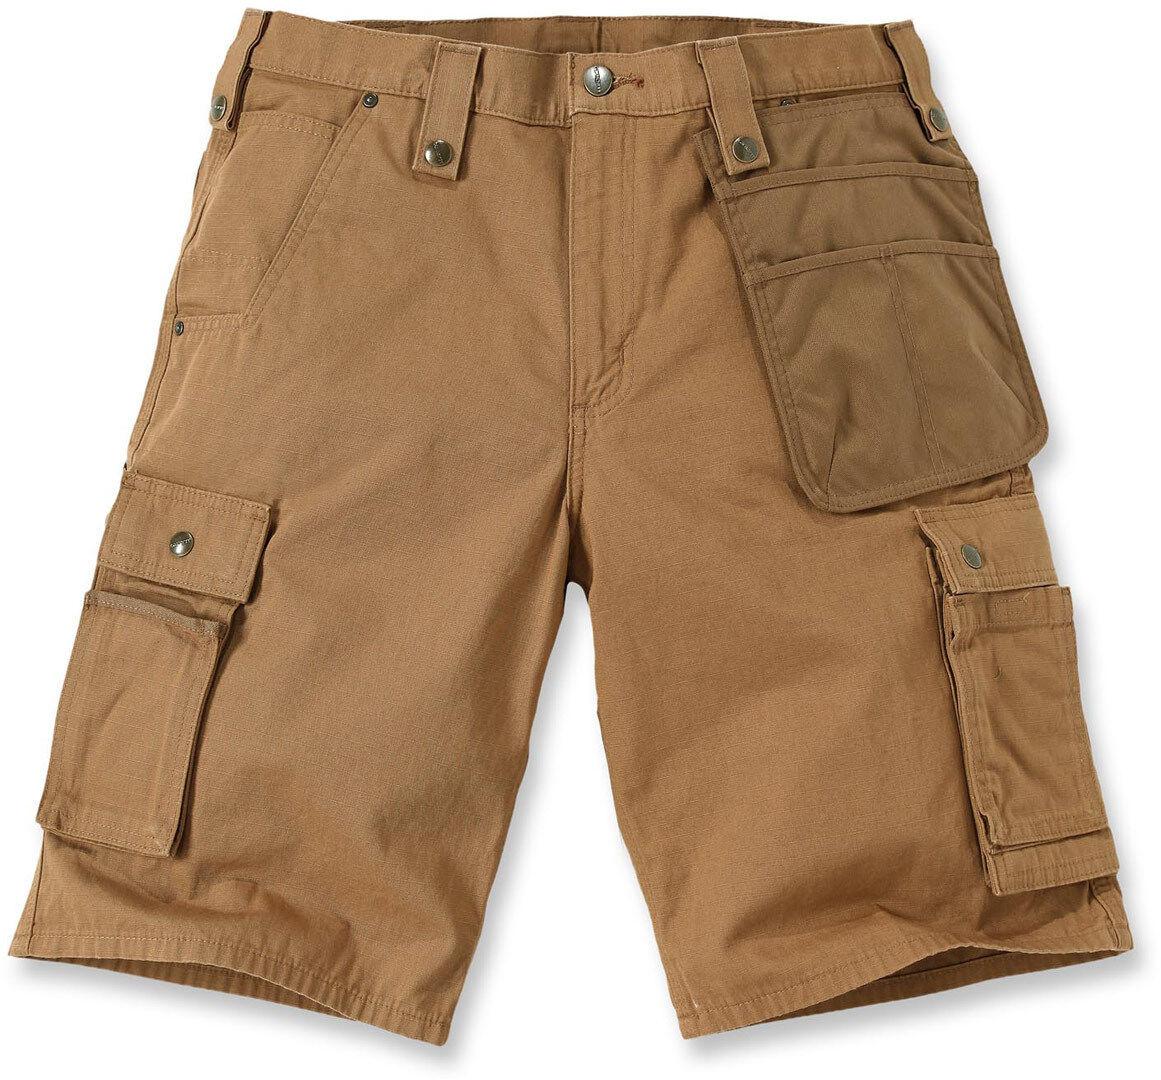 Carhartt Multi Pocket Ripstop Pantalones cortos Marrón 38